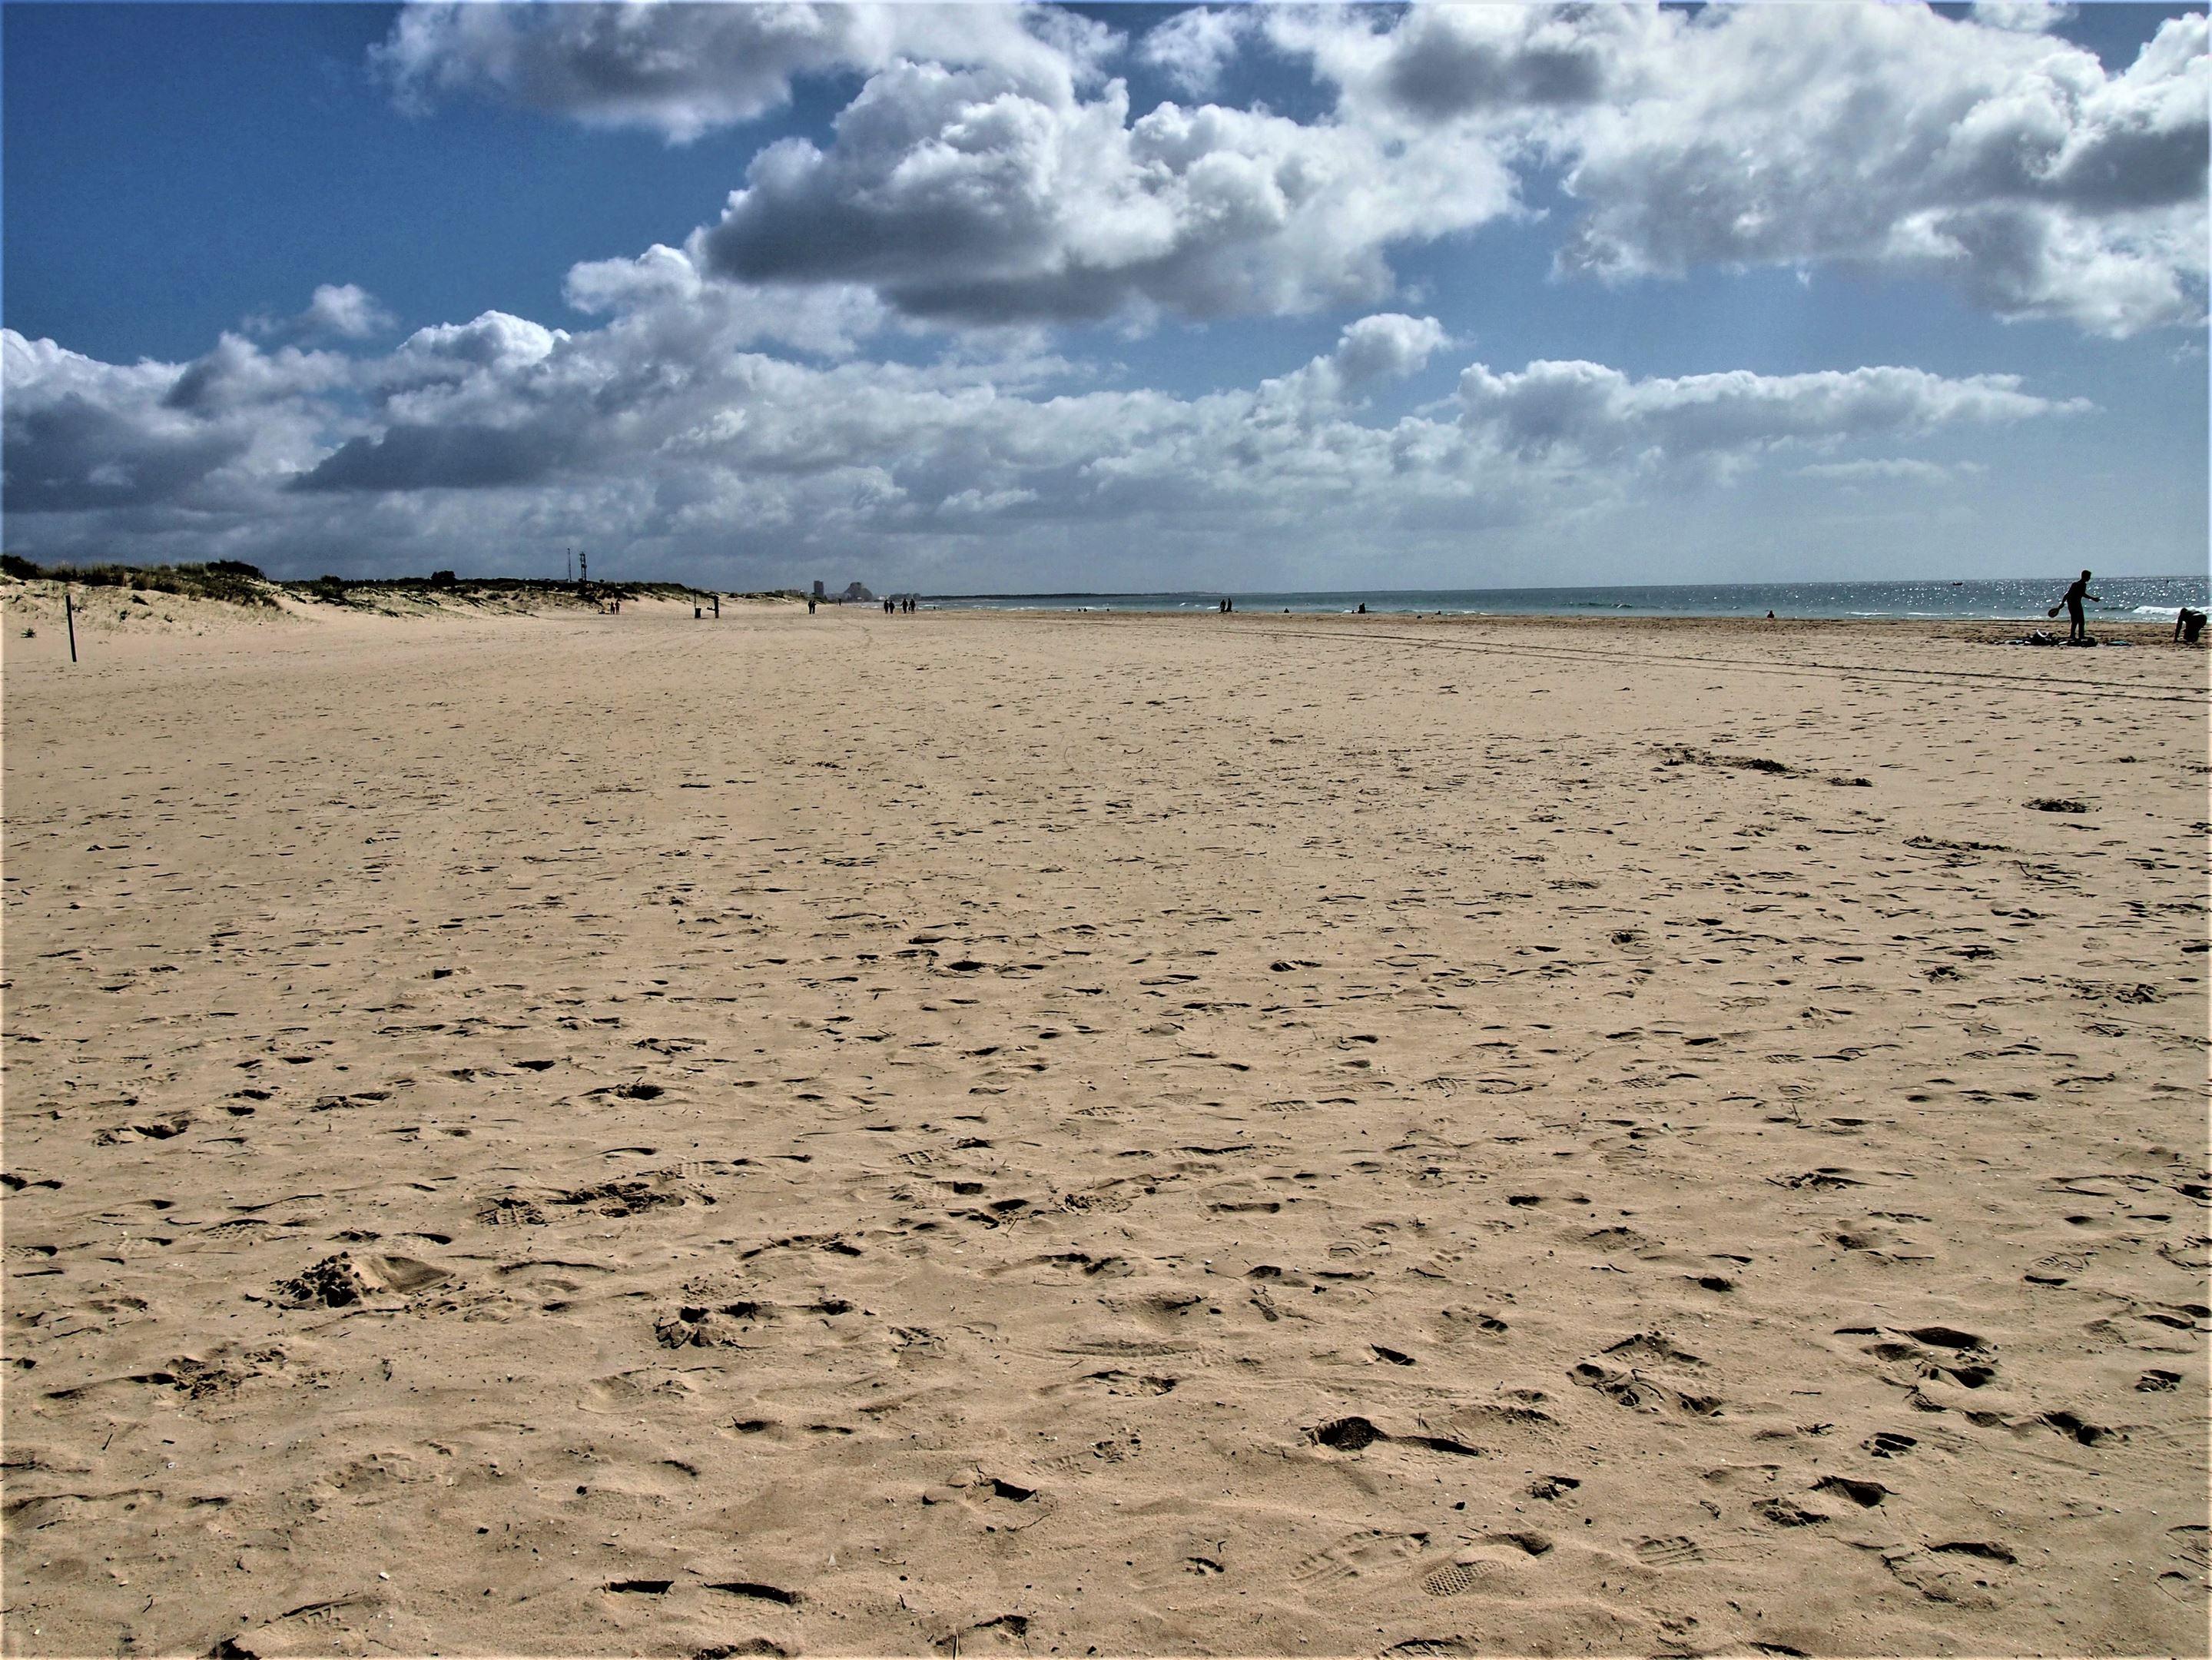 Praia da Alagoa, Algarve